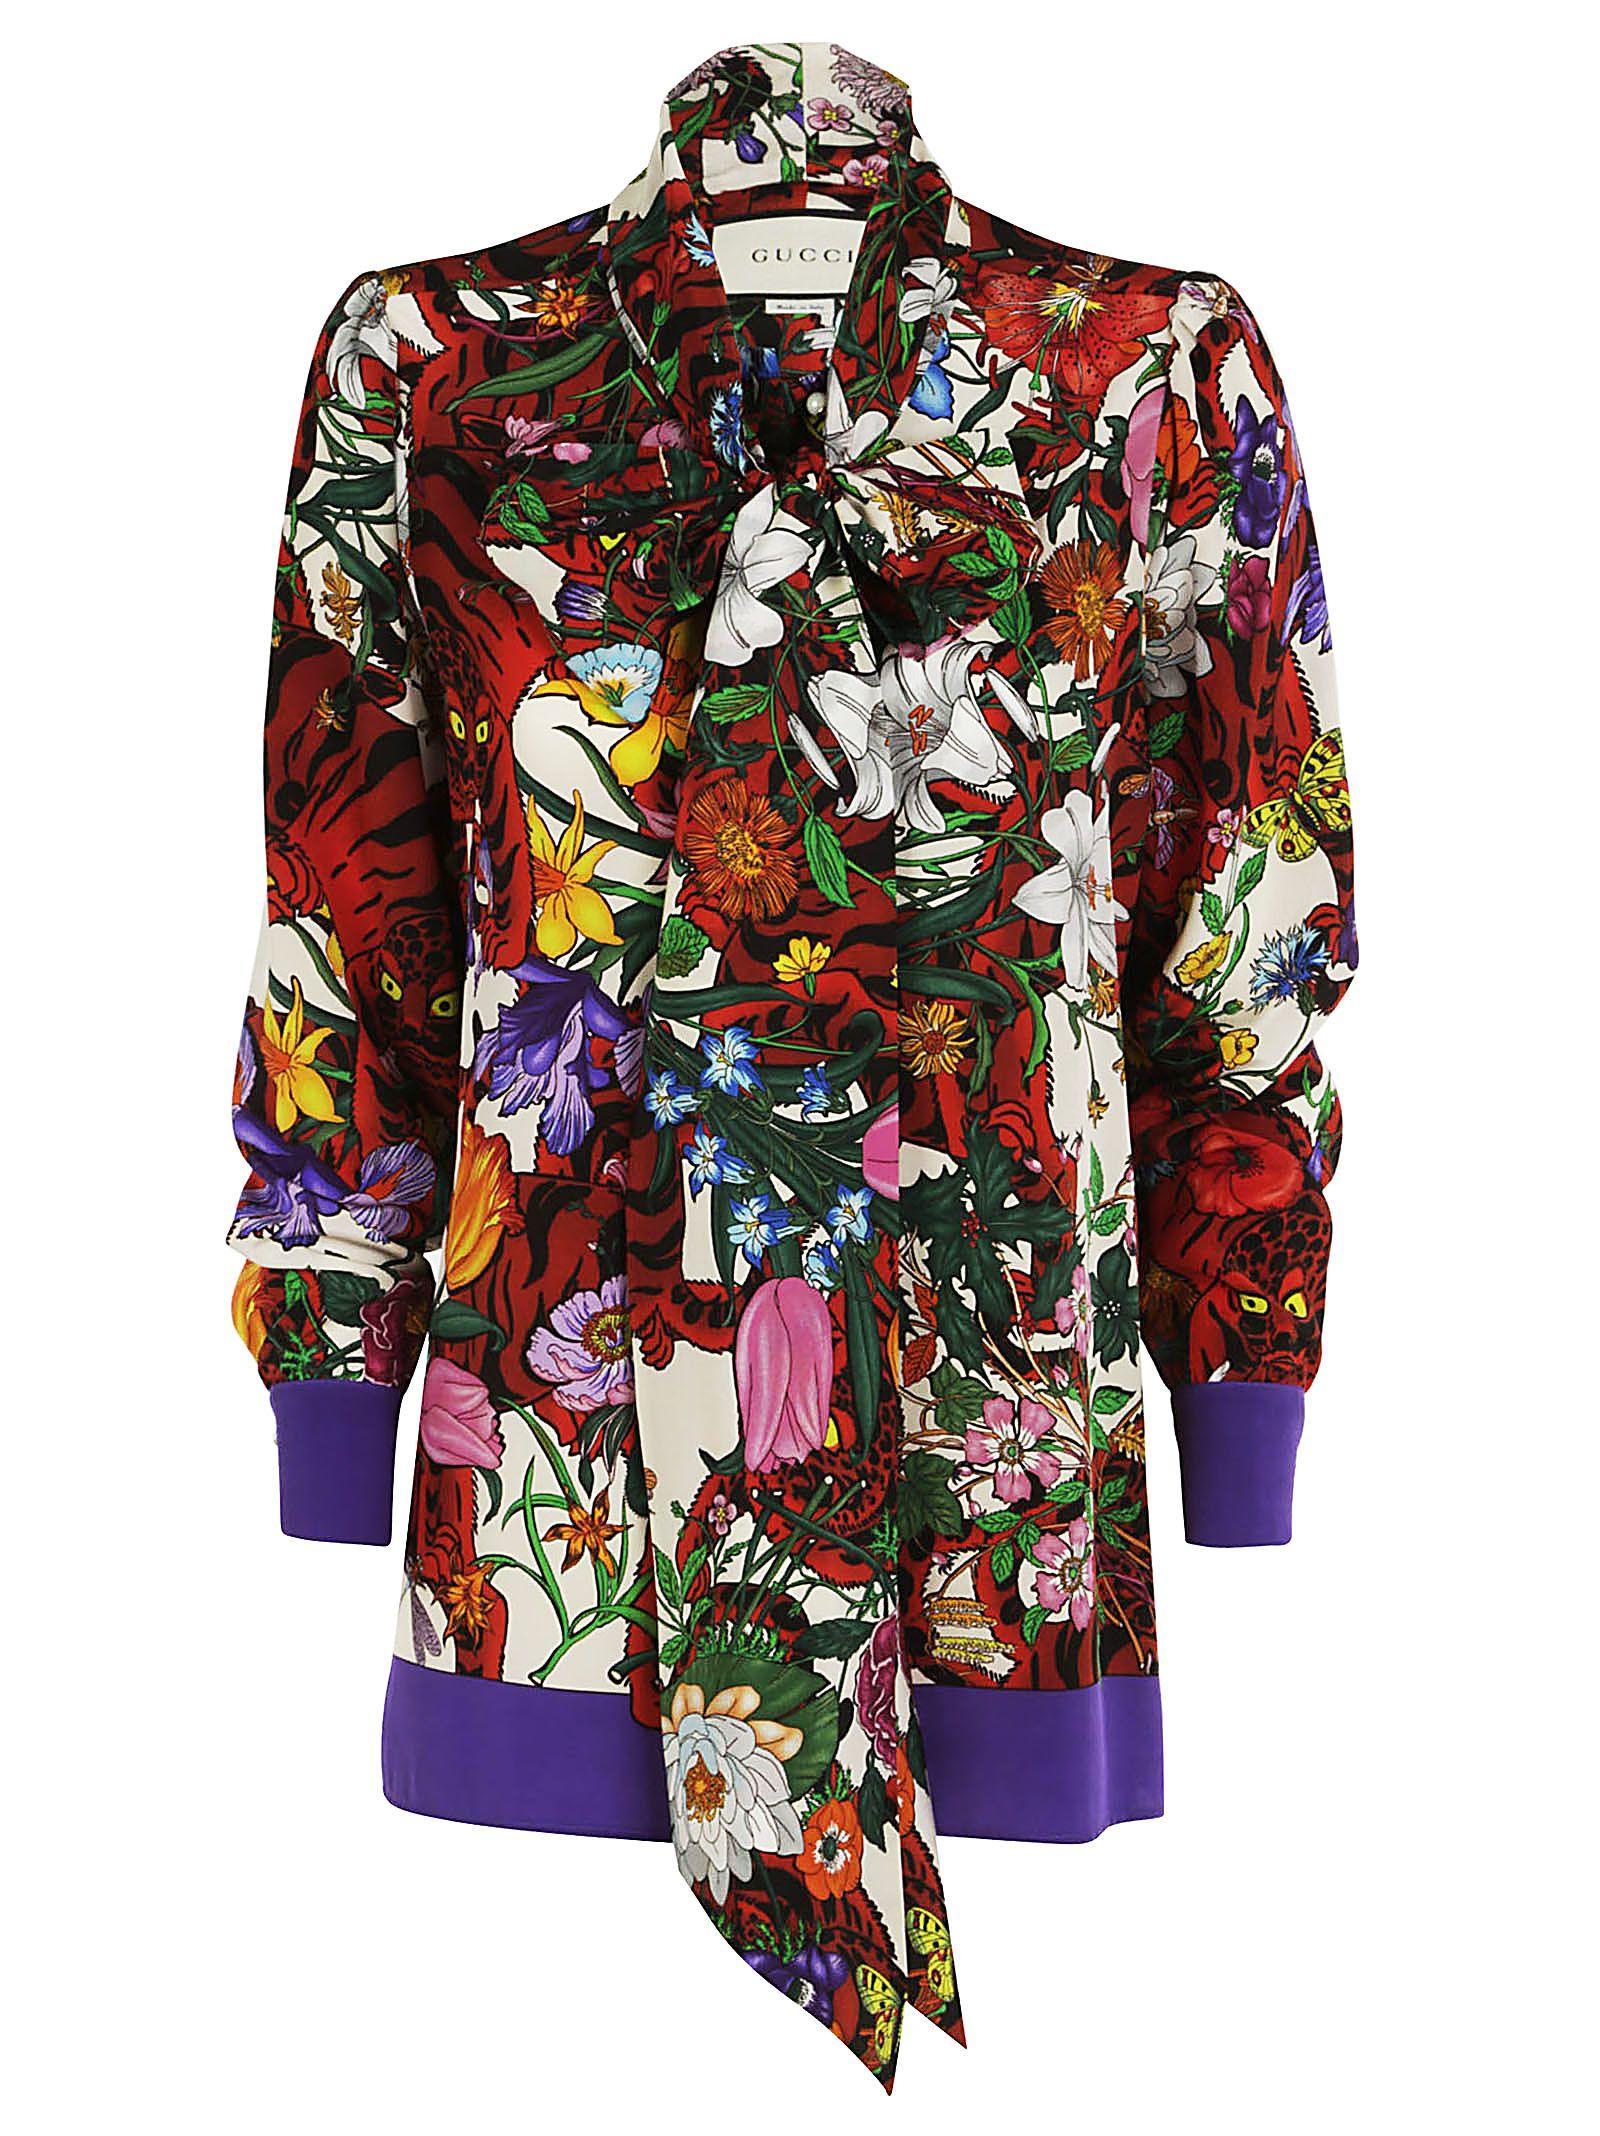 294507b4bdf9 Gucci Floral Tiger Print Shirt In Ivory Red | ModeSens